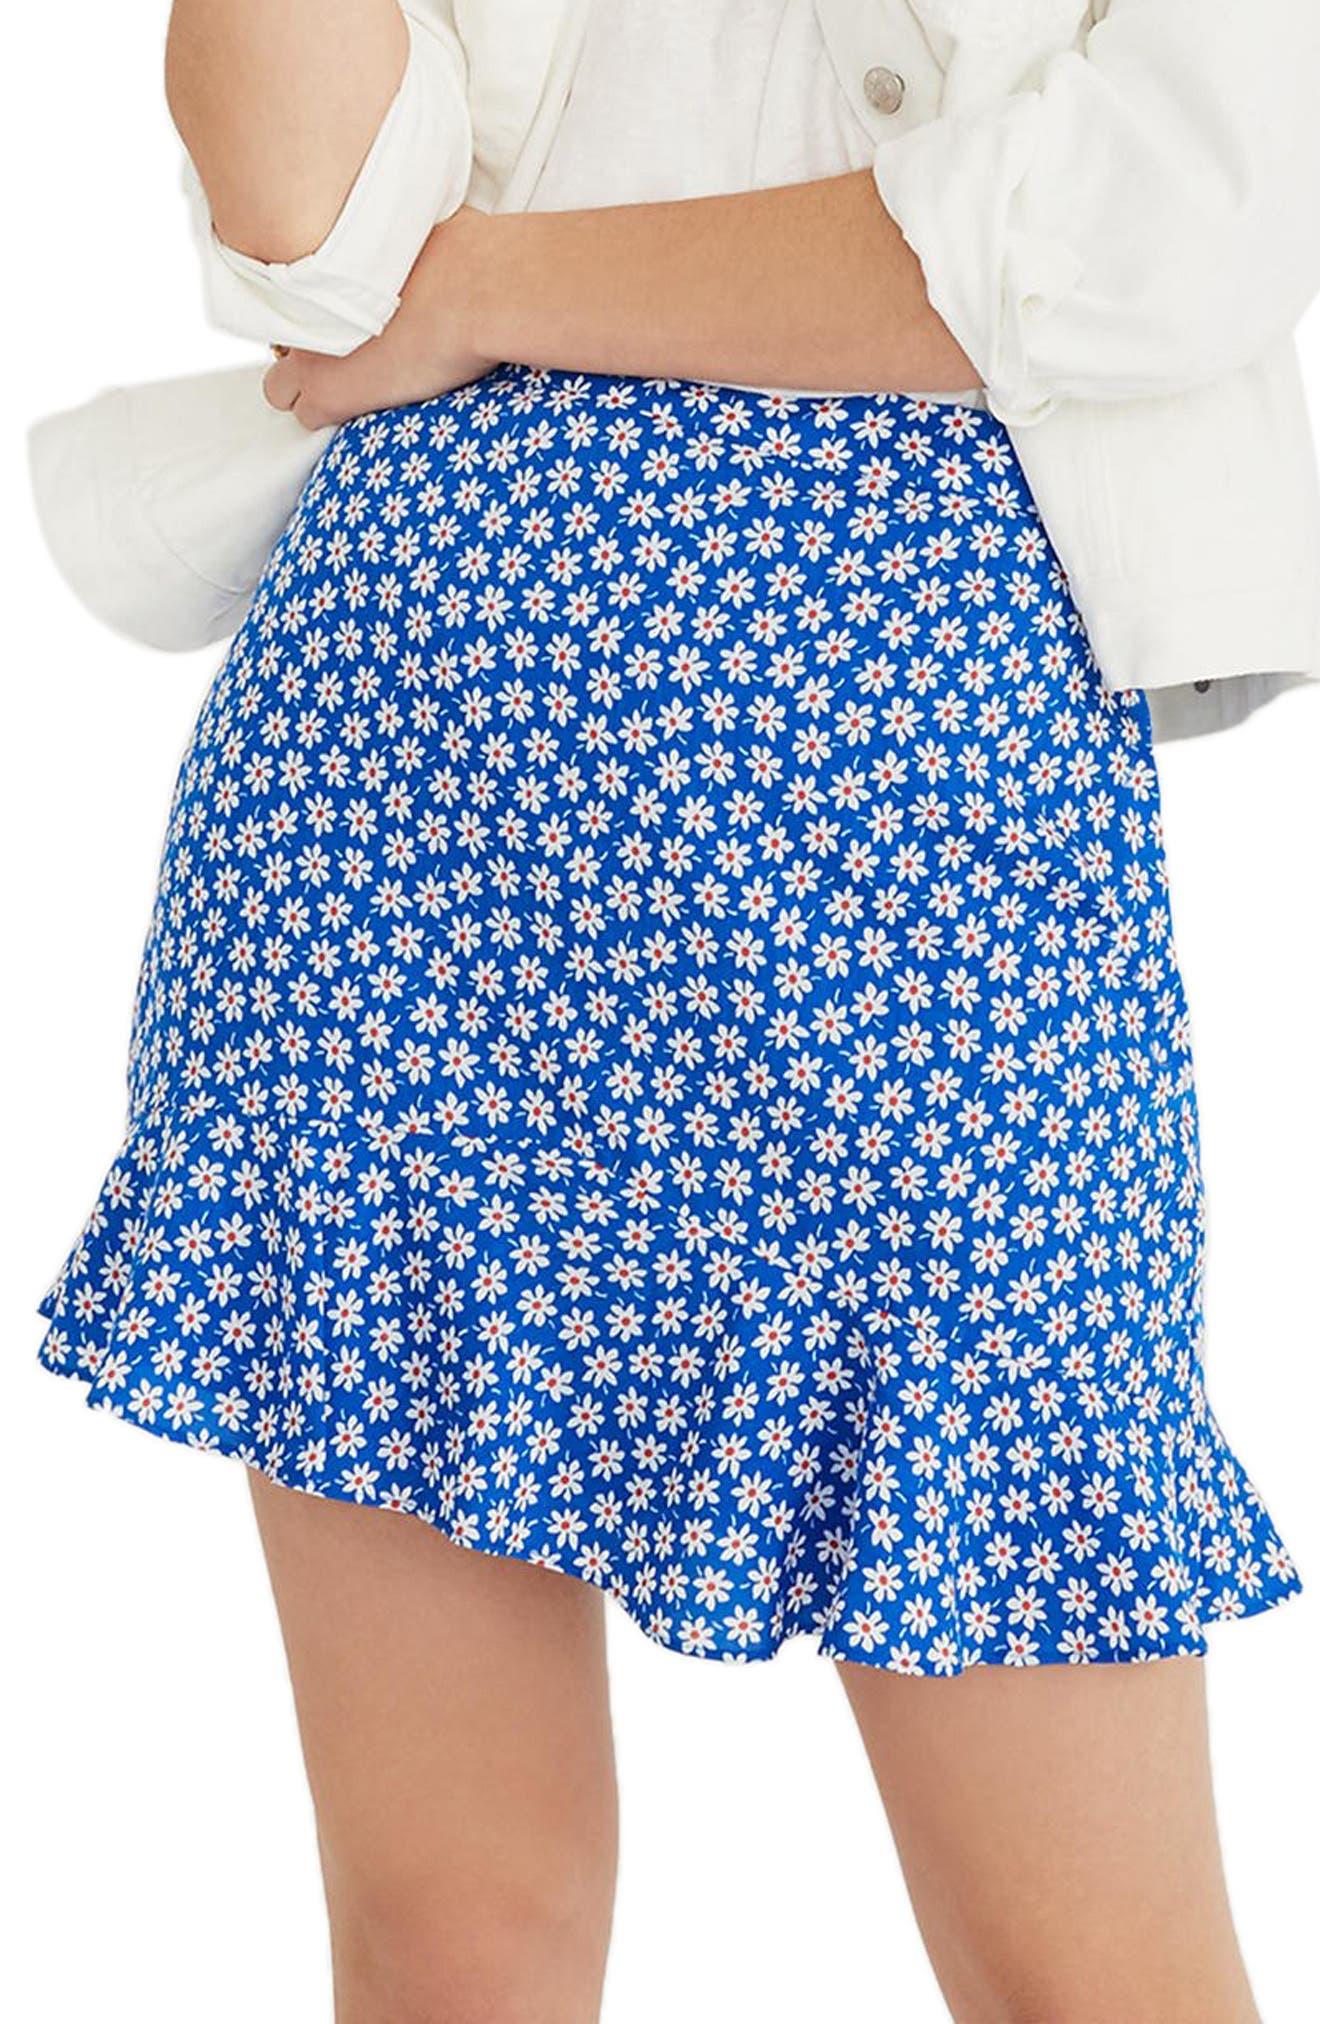 Daisy Print Ruffle Miniskirt,                             Main thumbnail 1, color,                             BRILLIANT ROYAL